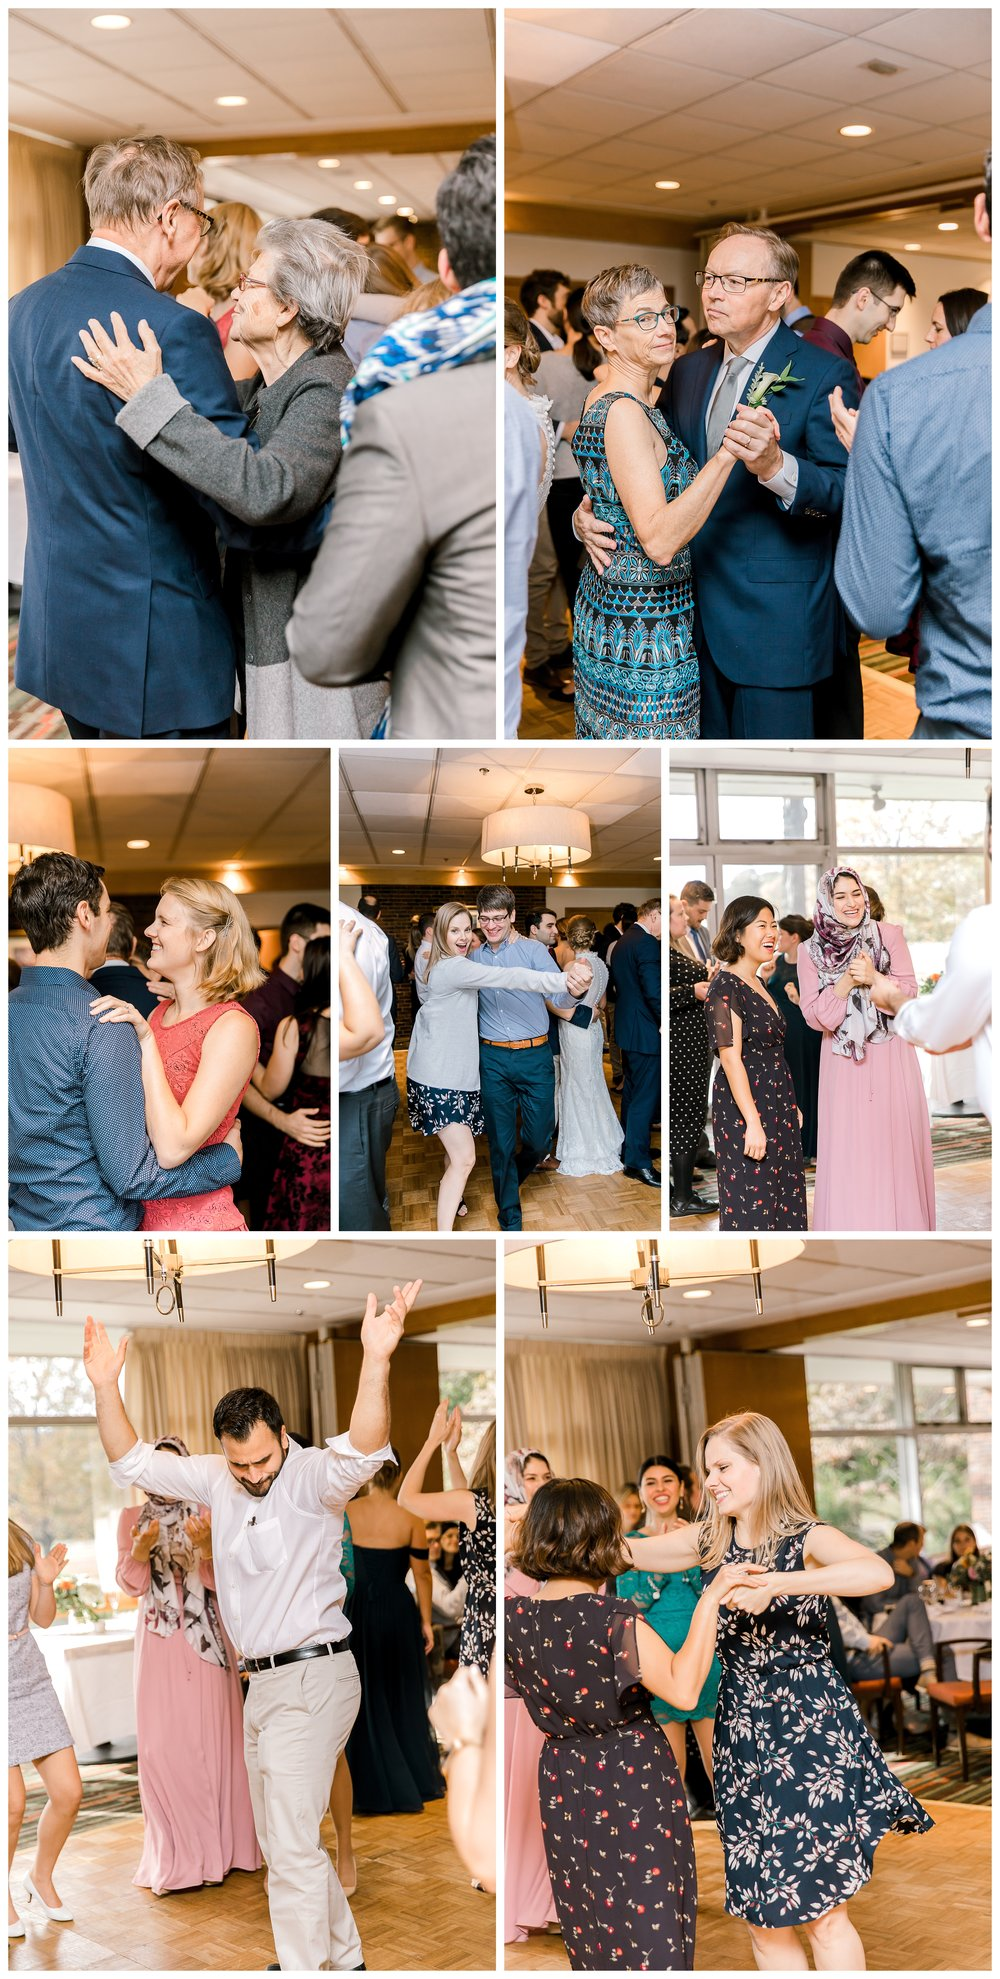 wellesley_college_fall_wedding_boston_photographer_erica_pezente_photo (29).jpg